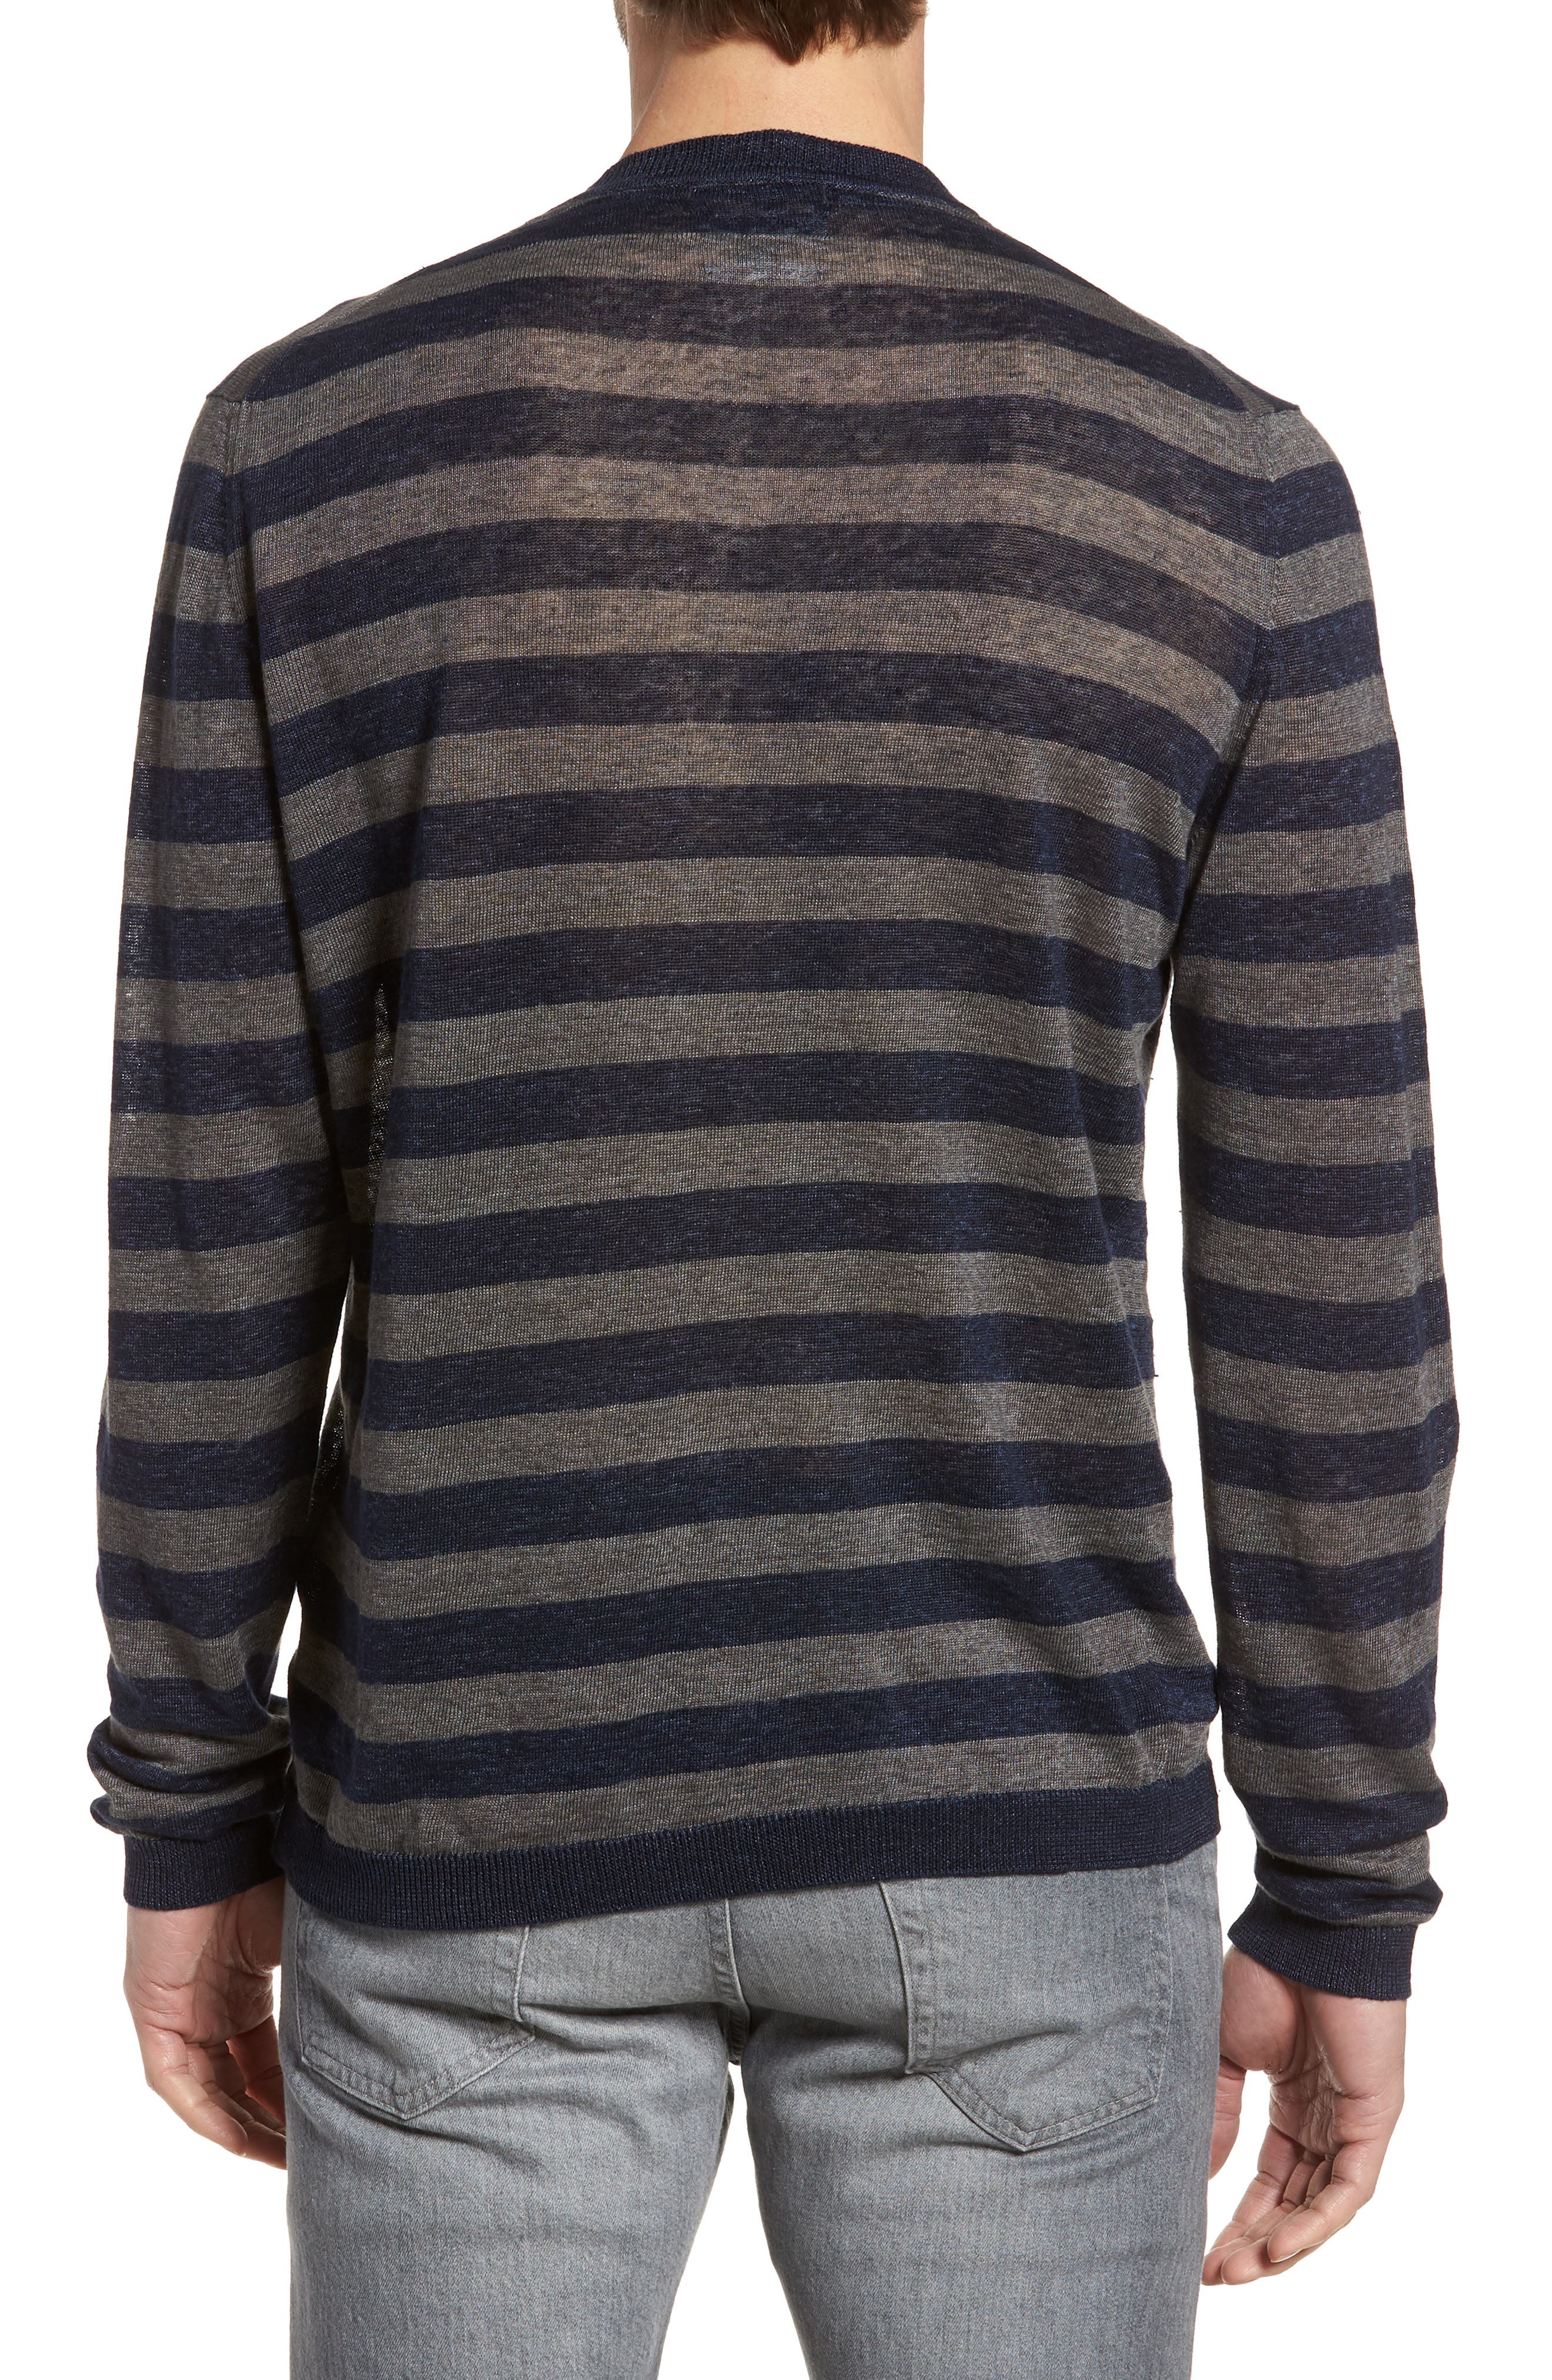 & Bros. Stripe Linen Sweater,                             Alternate thumbnail 2, color,                             Navy Stripe